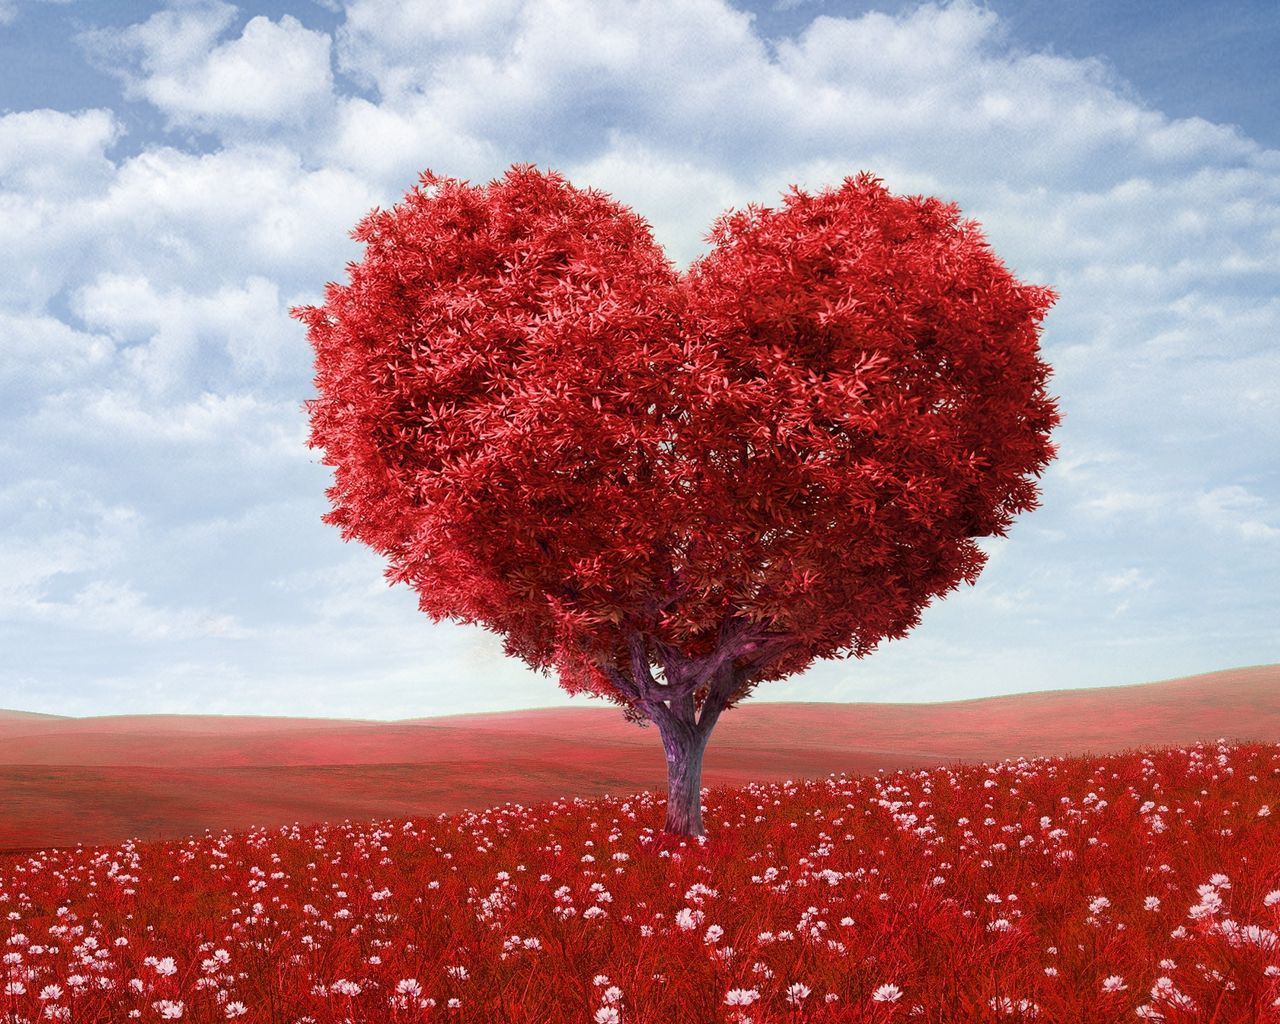 1280x1024 Wallpaper tree, heart, photoshop, field, grass, romance